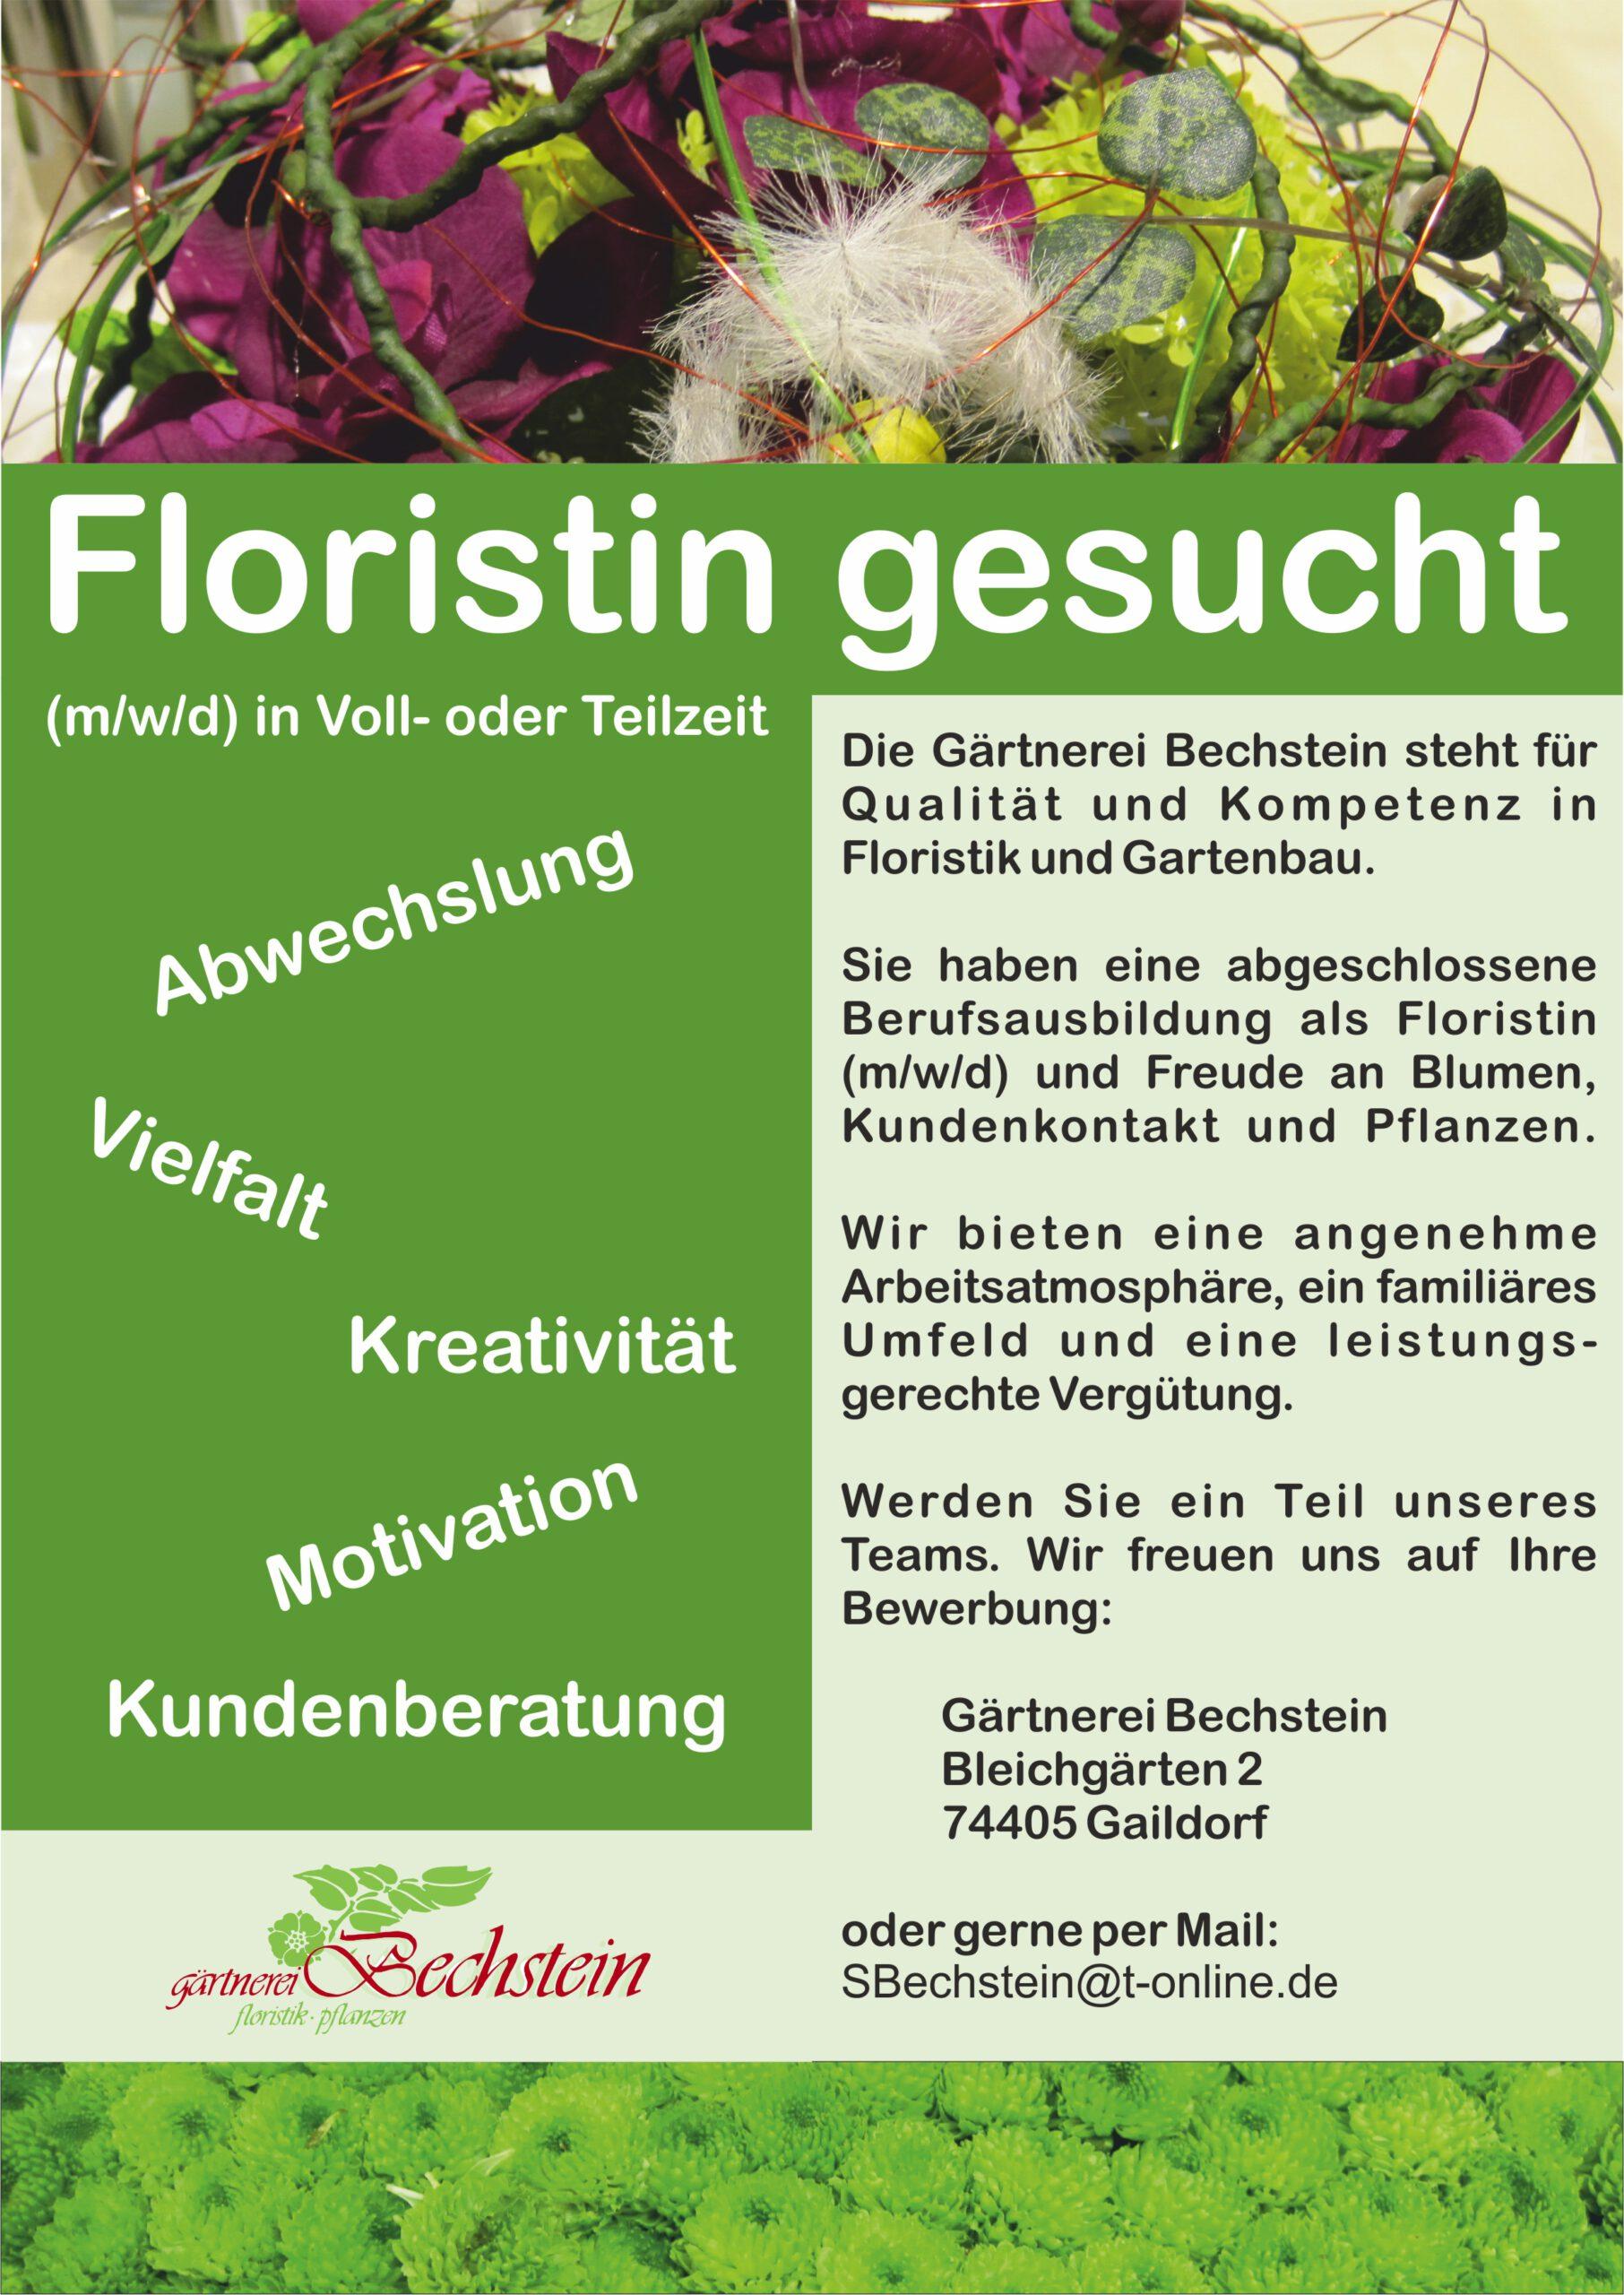 Stellenangebot Gaildorf FloristIn